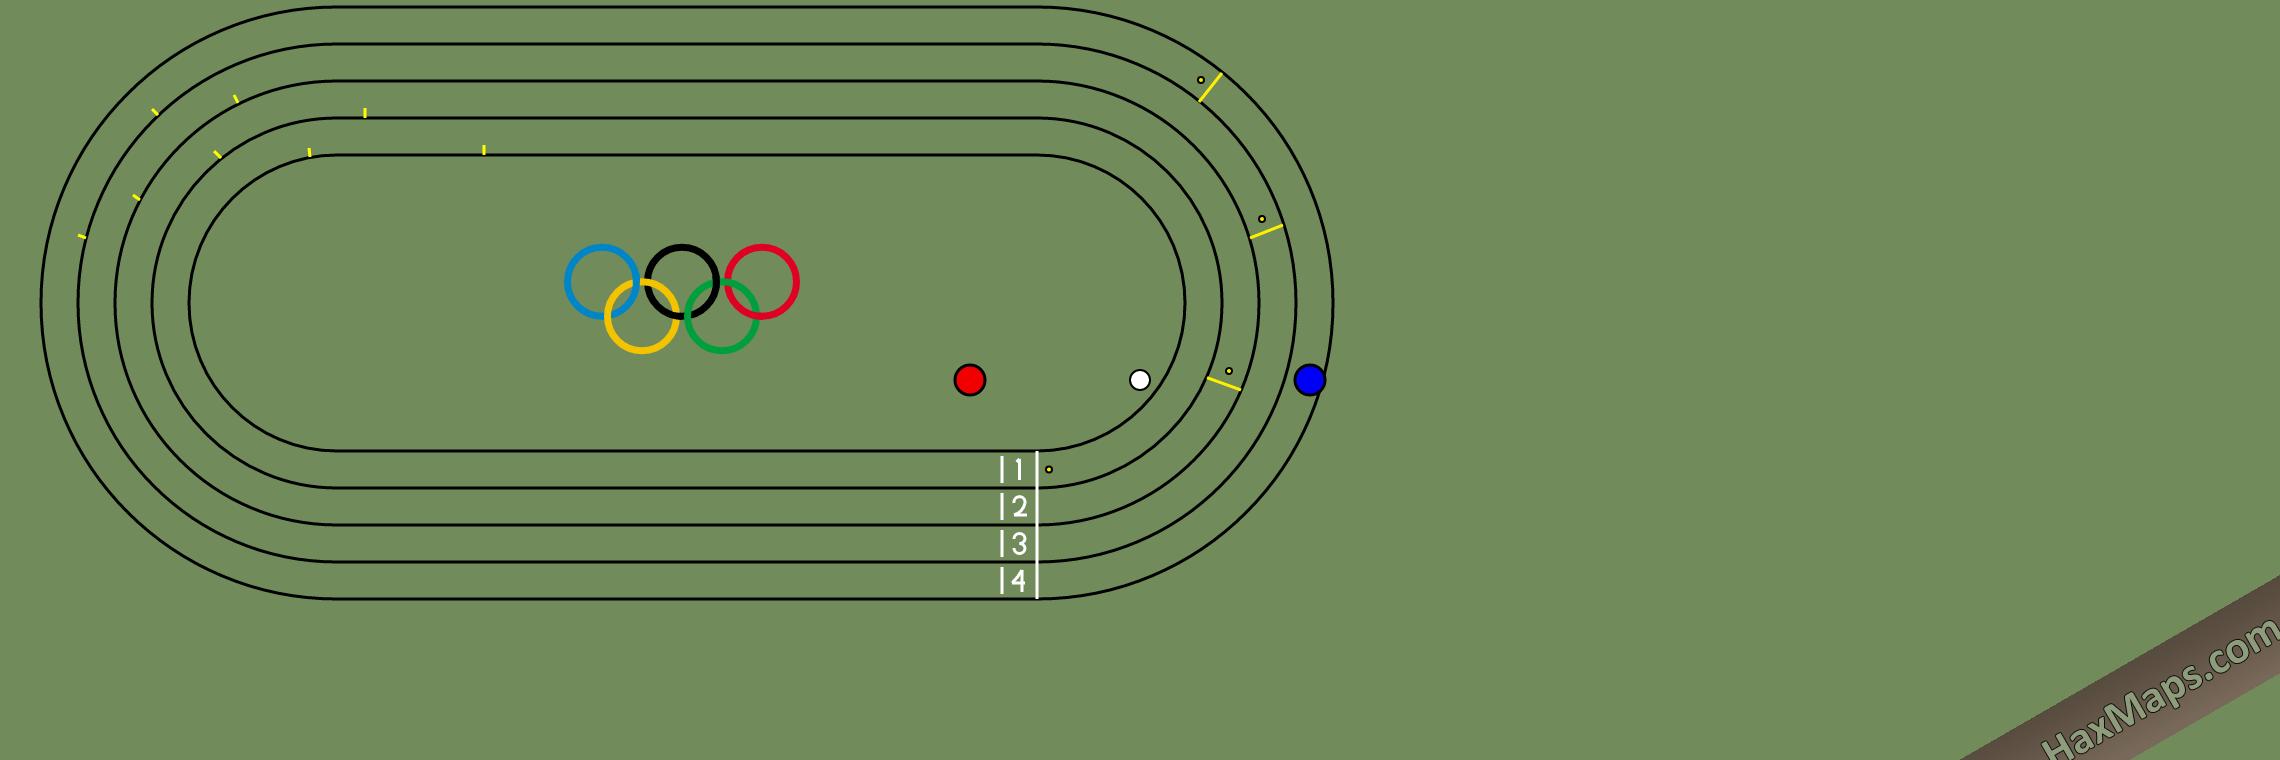 hax ball maps   400m with AutoStart